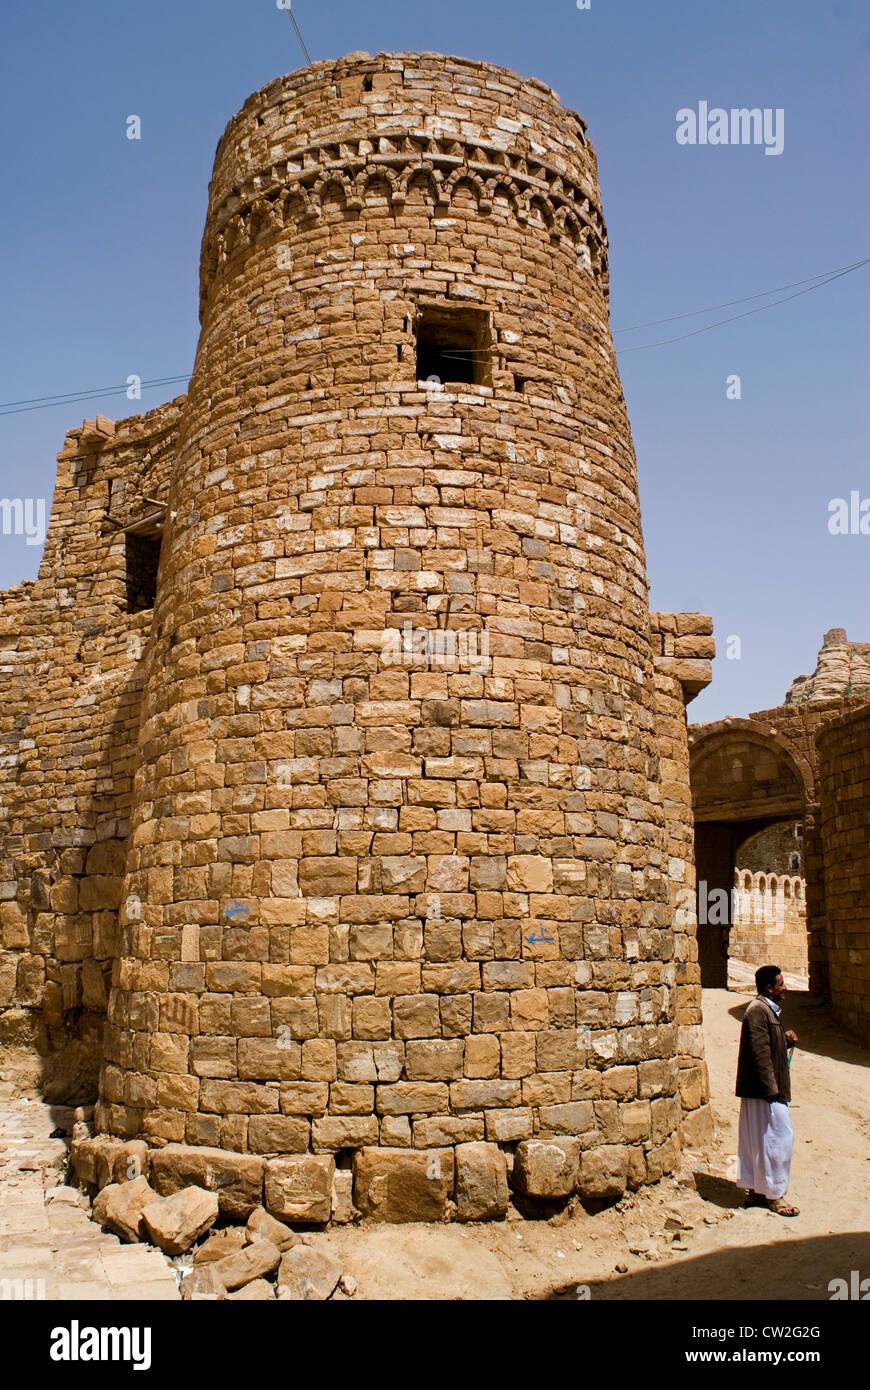 Fortification of Thula, the Highlands region, Yemen, Western Asia, Arabian Peninsula. - Stock Image